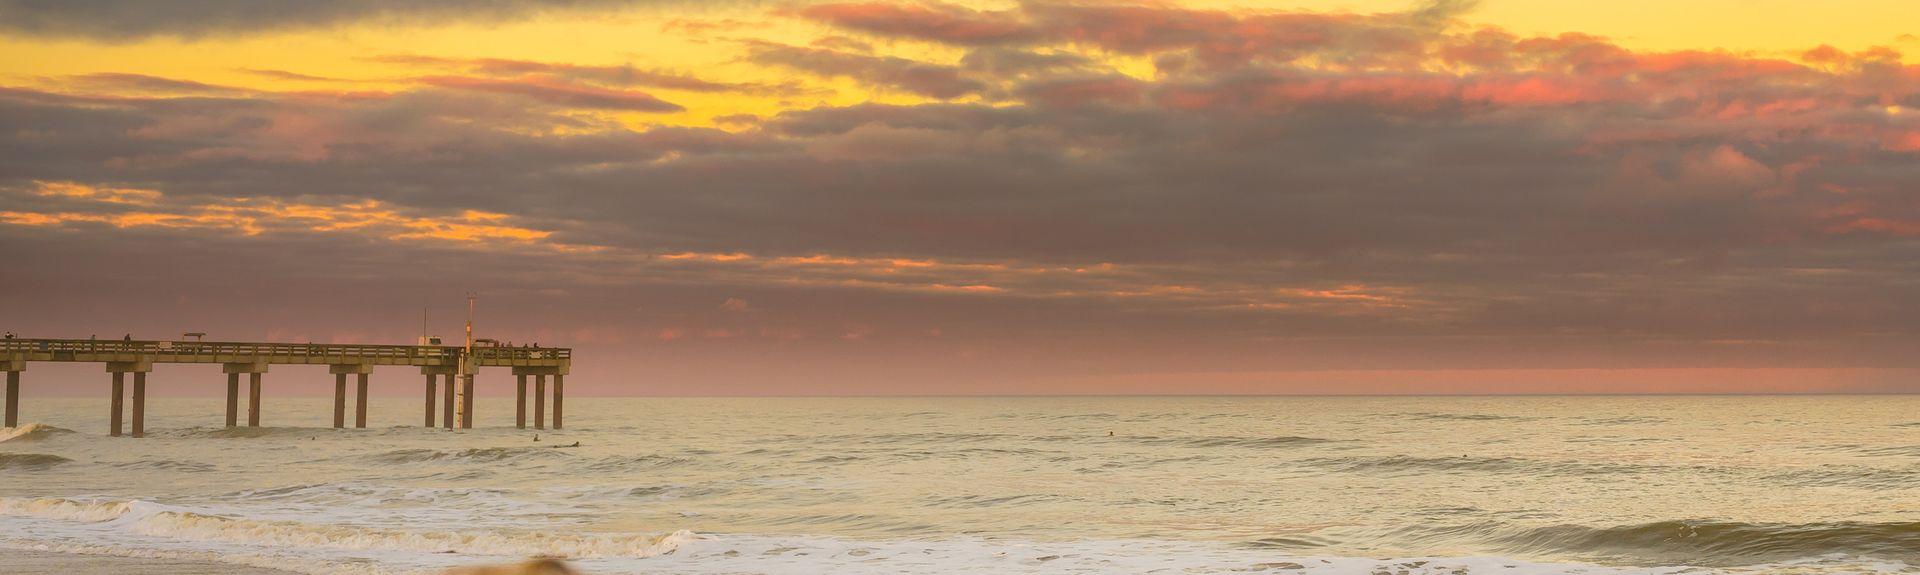 Surfcrest Village, St. Augustine Beach, Florida, Stati Uniti d'America